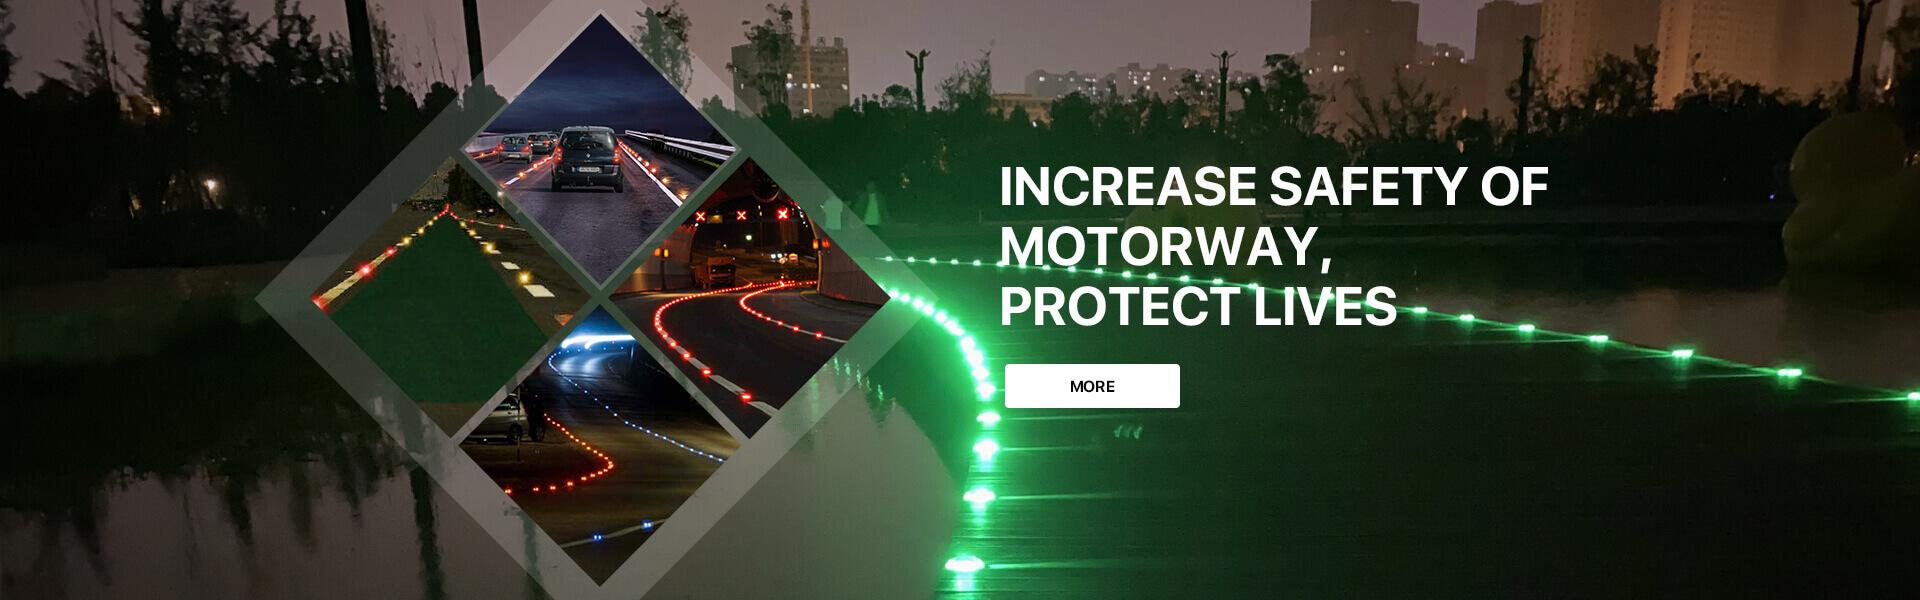 motorway solar road stud manufacturer